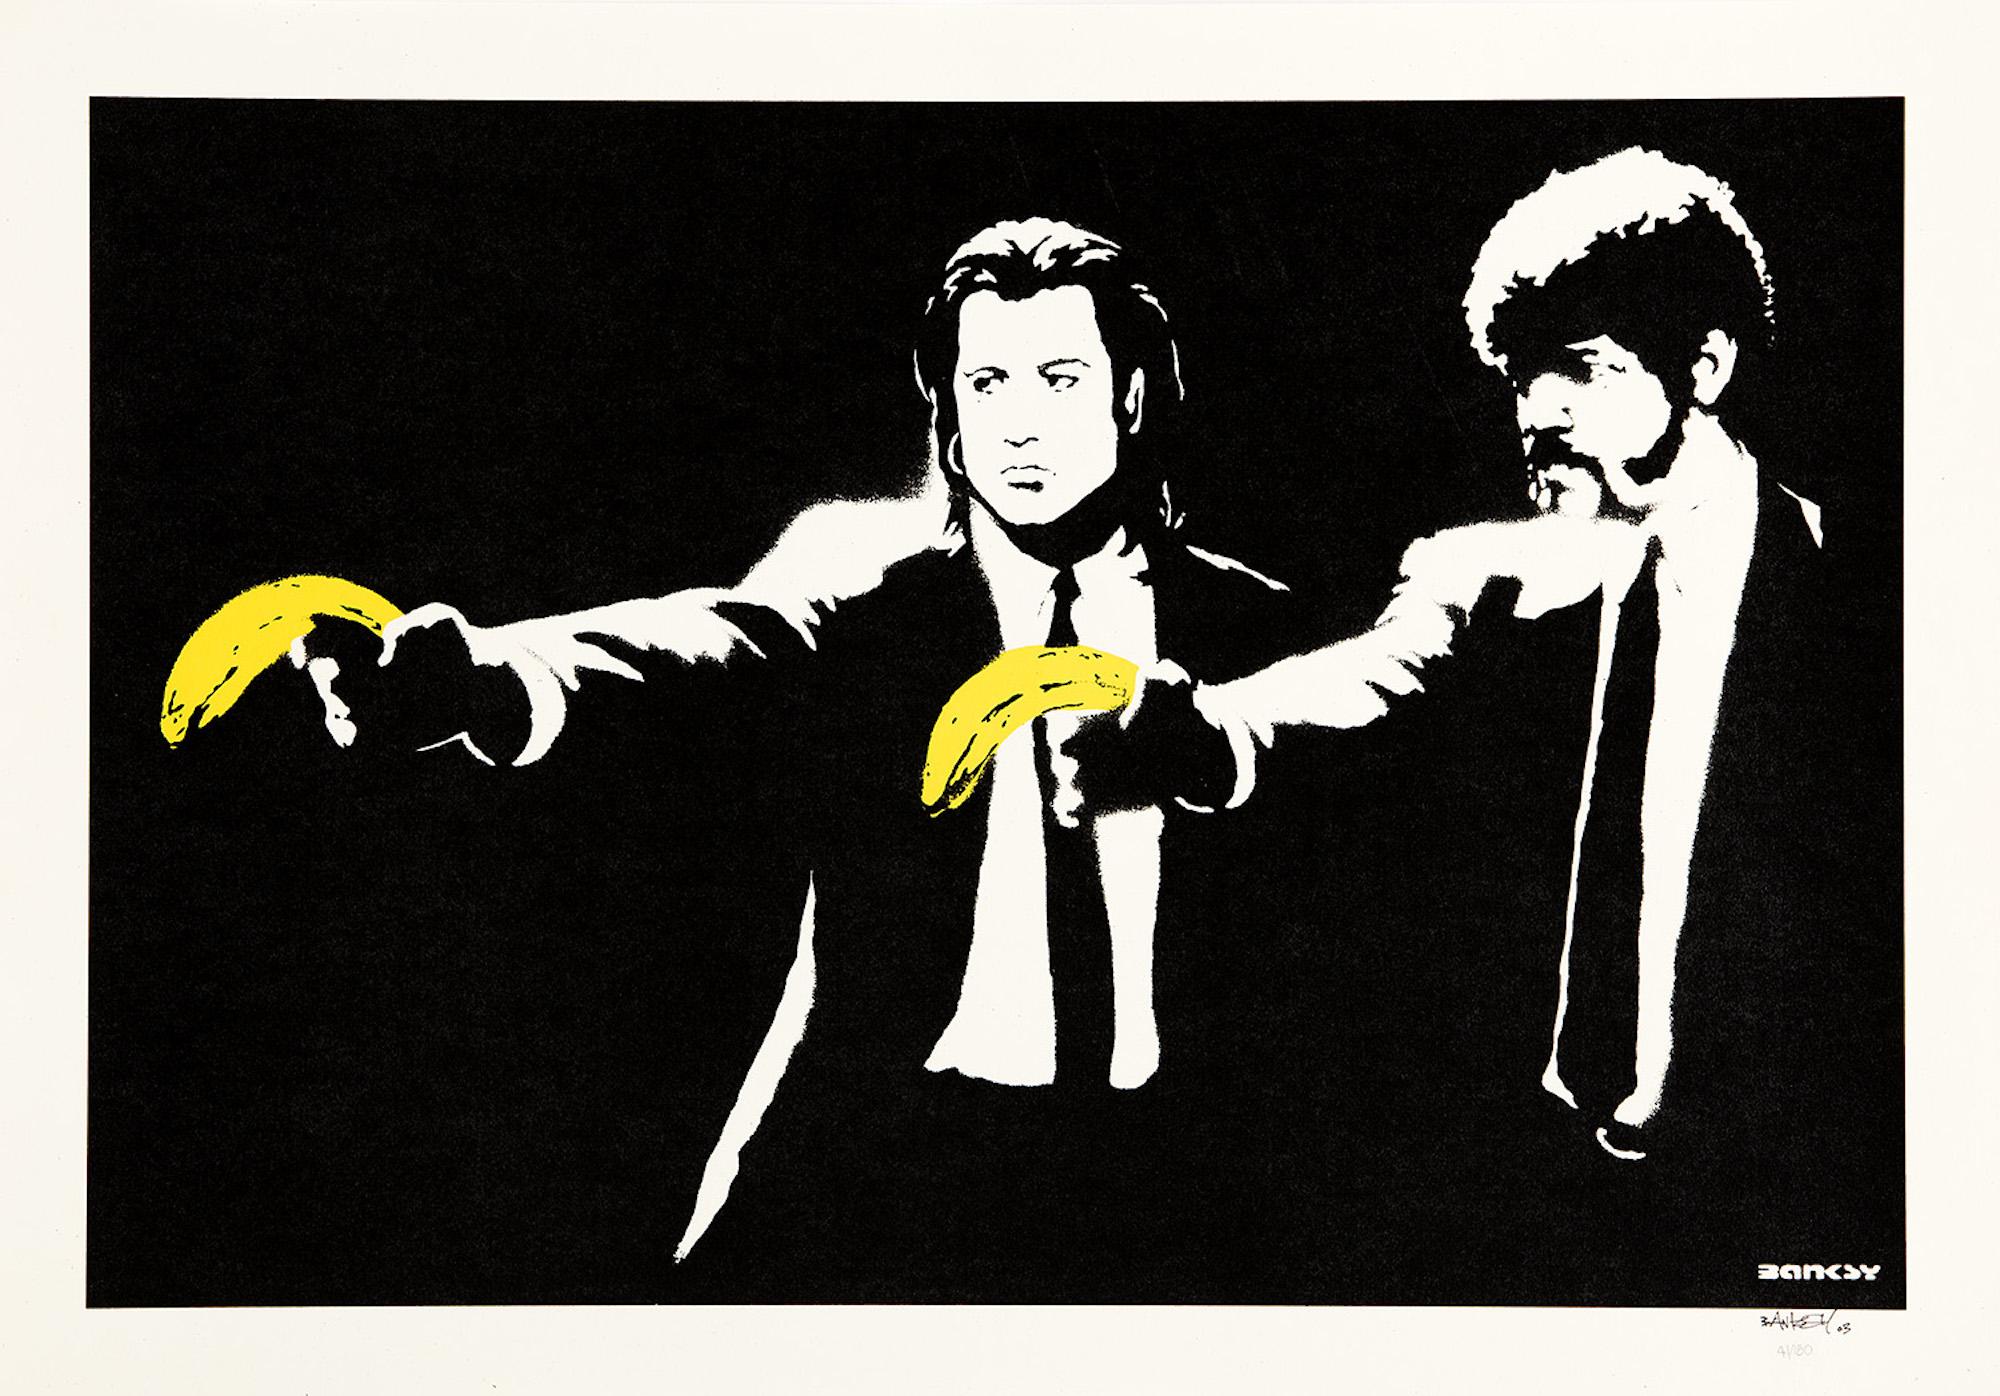 Banksy - Pulp Fiction - Signed Screenprint